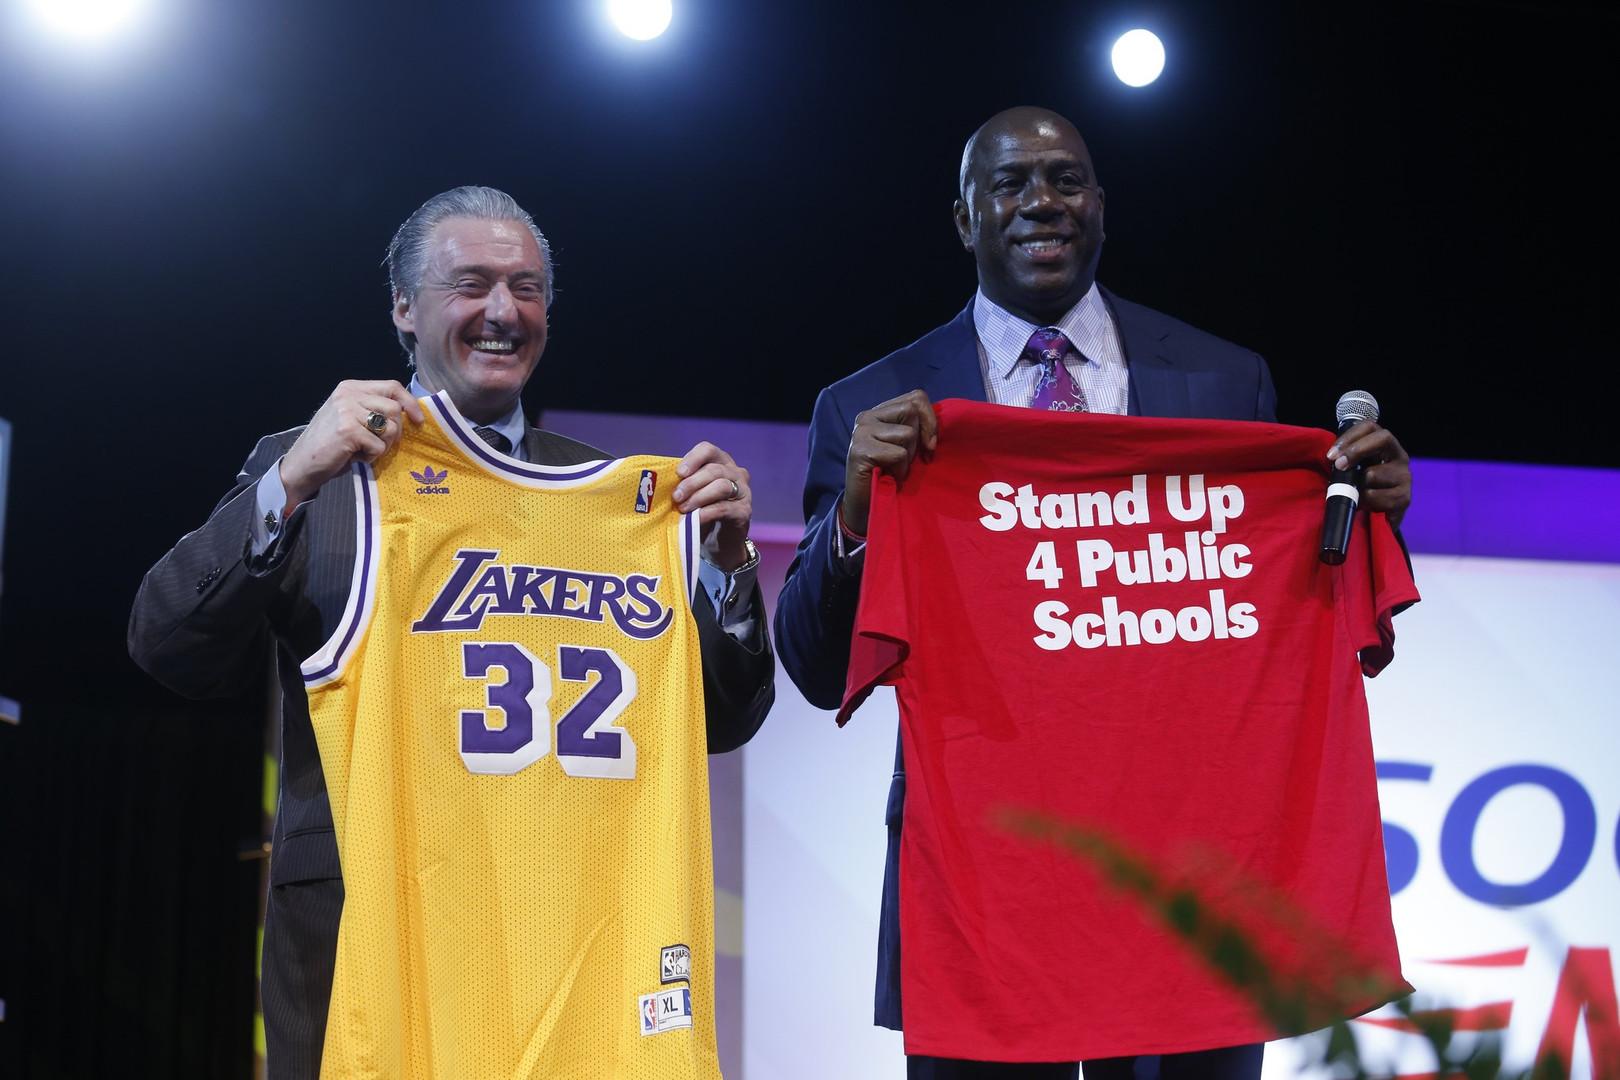 David Pickler and Magic Johnson | Stand Up 4 Public Schools | American Public Education Foundation